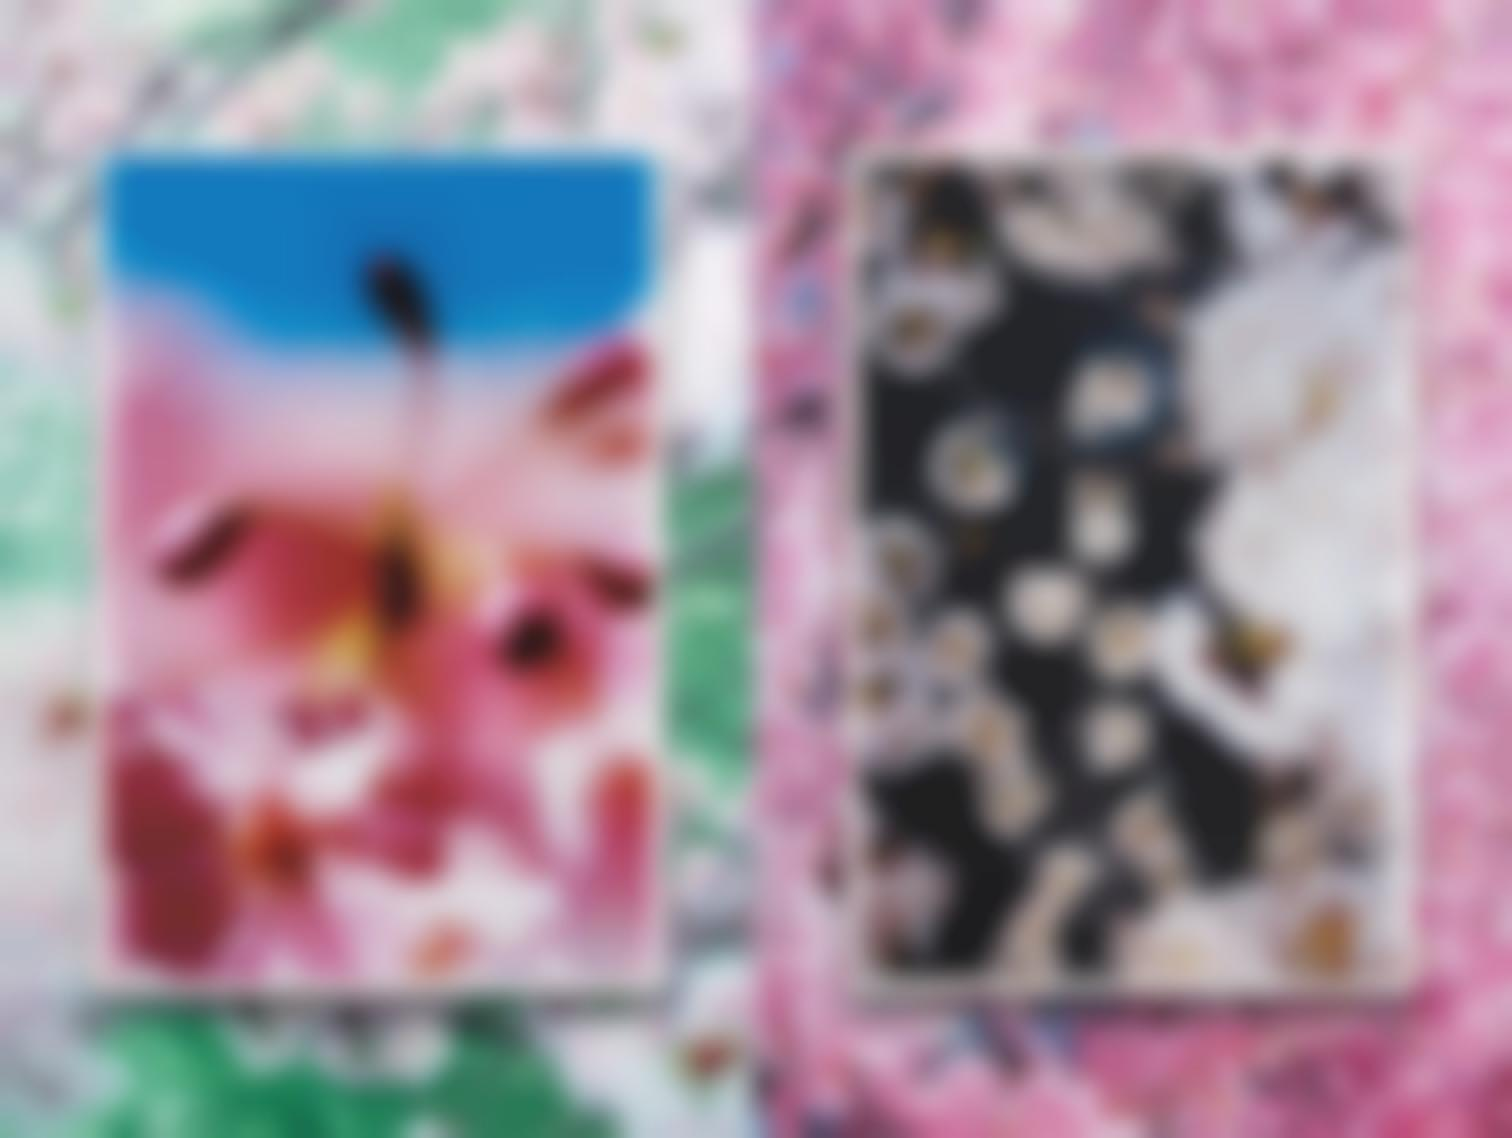 Mika Ninagawa-Earthly Flowers, Heavenly Colors-2018